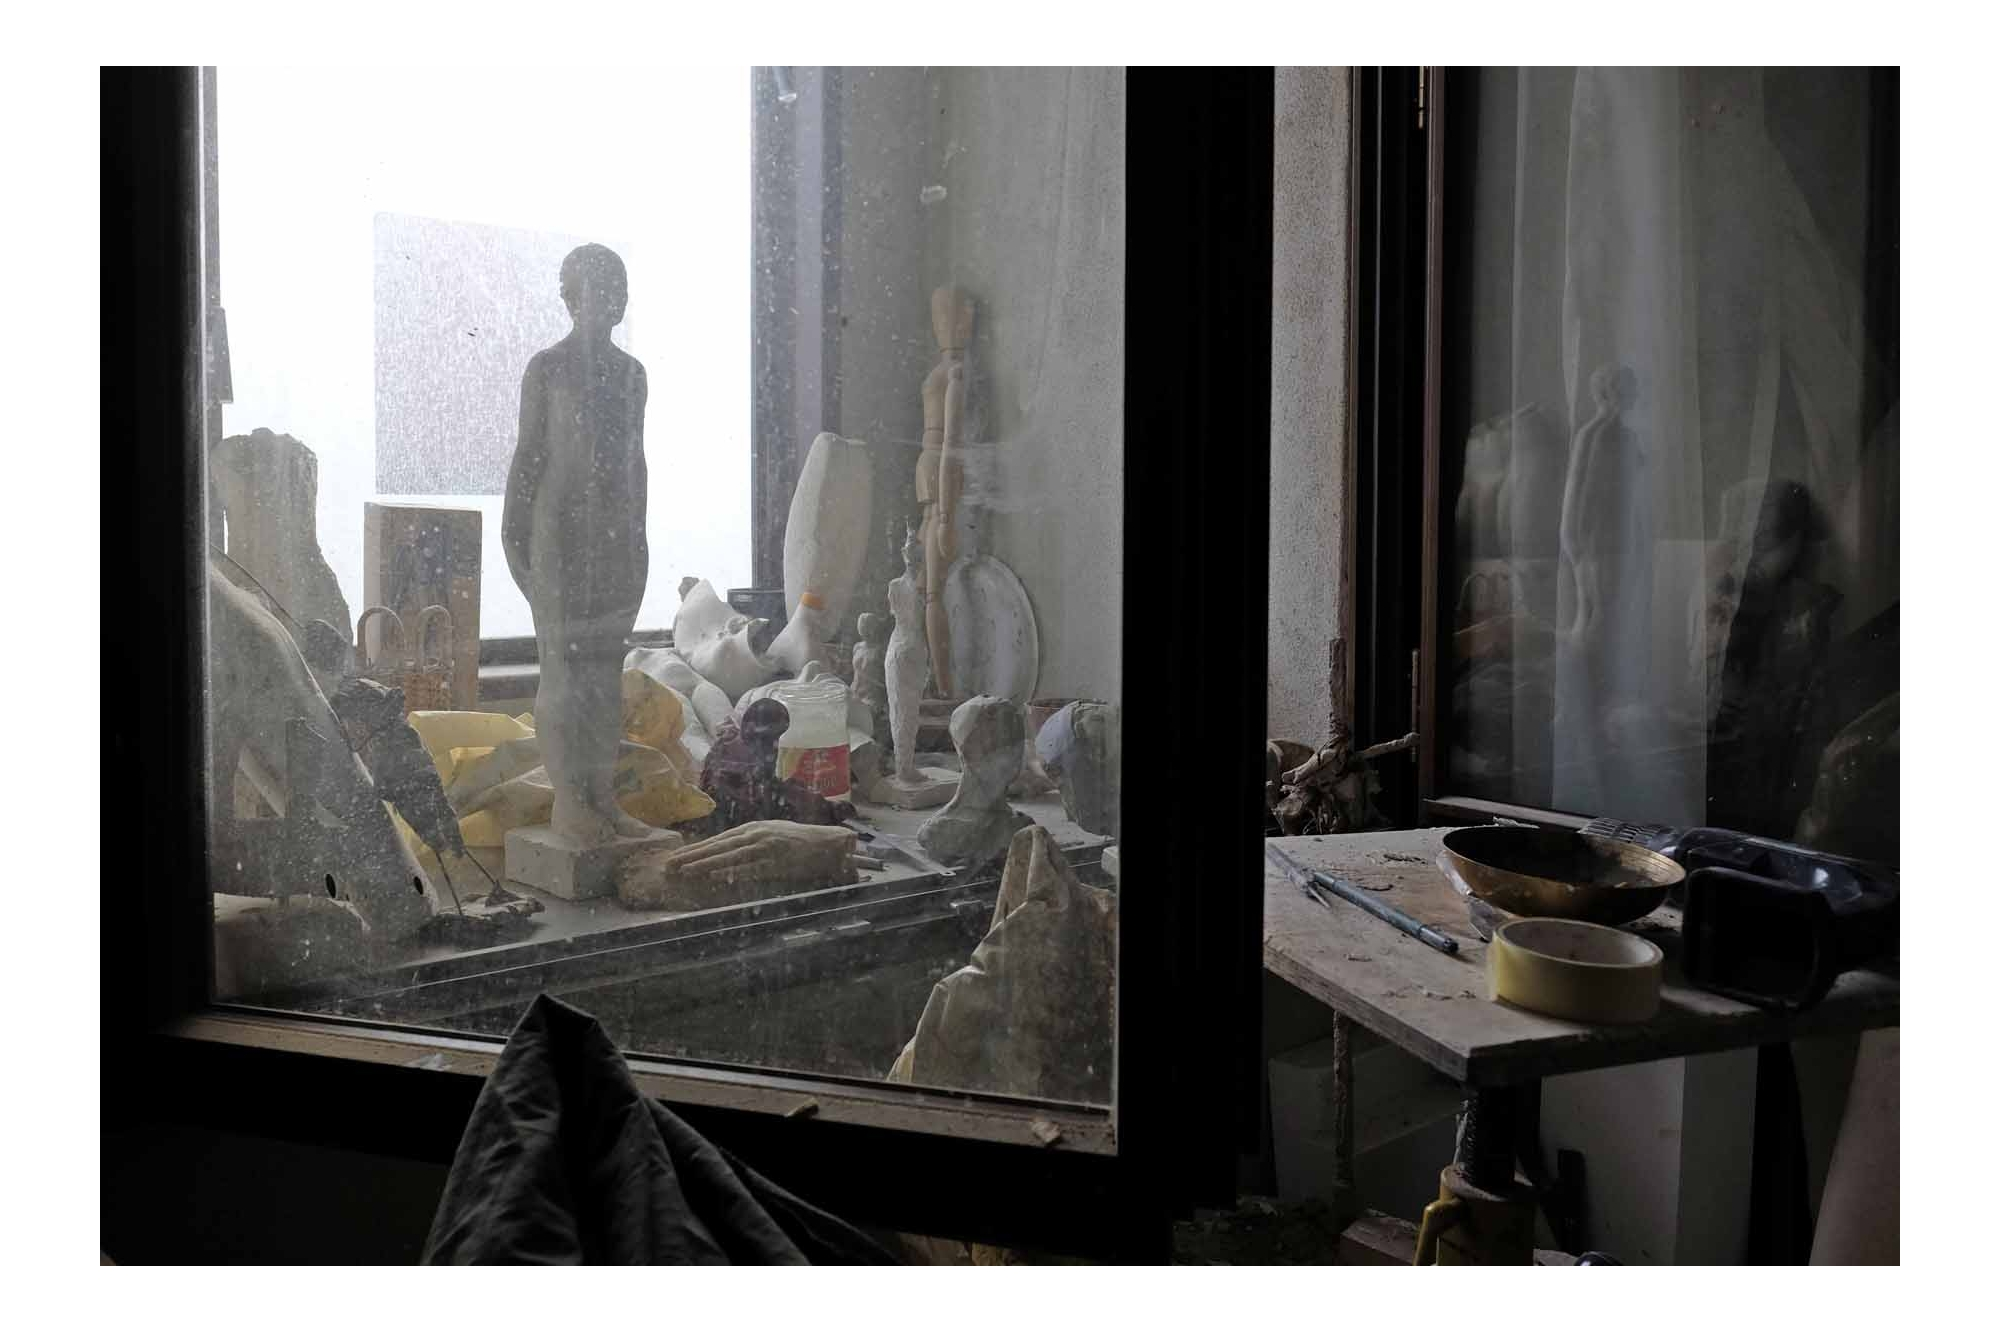 Paul Stebler's Atelier in der alten Kaserne